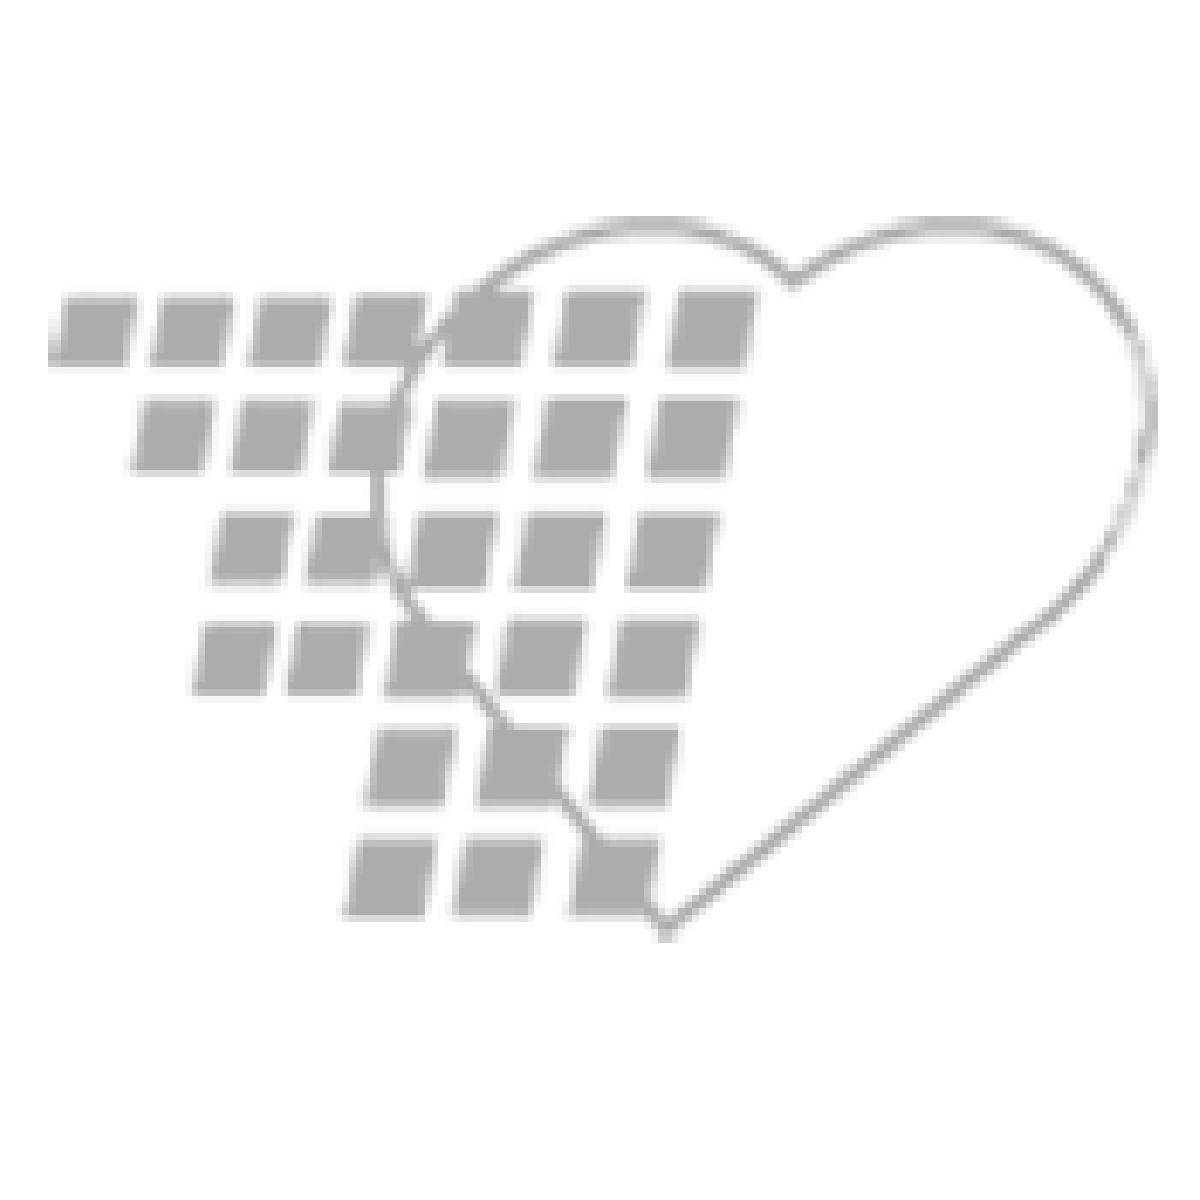 06-93-8500 - Demo Dose® Naloxon Narcn 1mg ml Response Kit